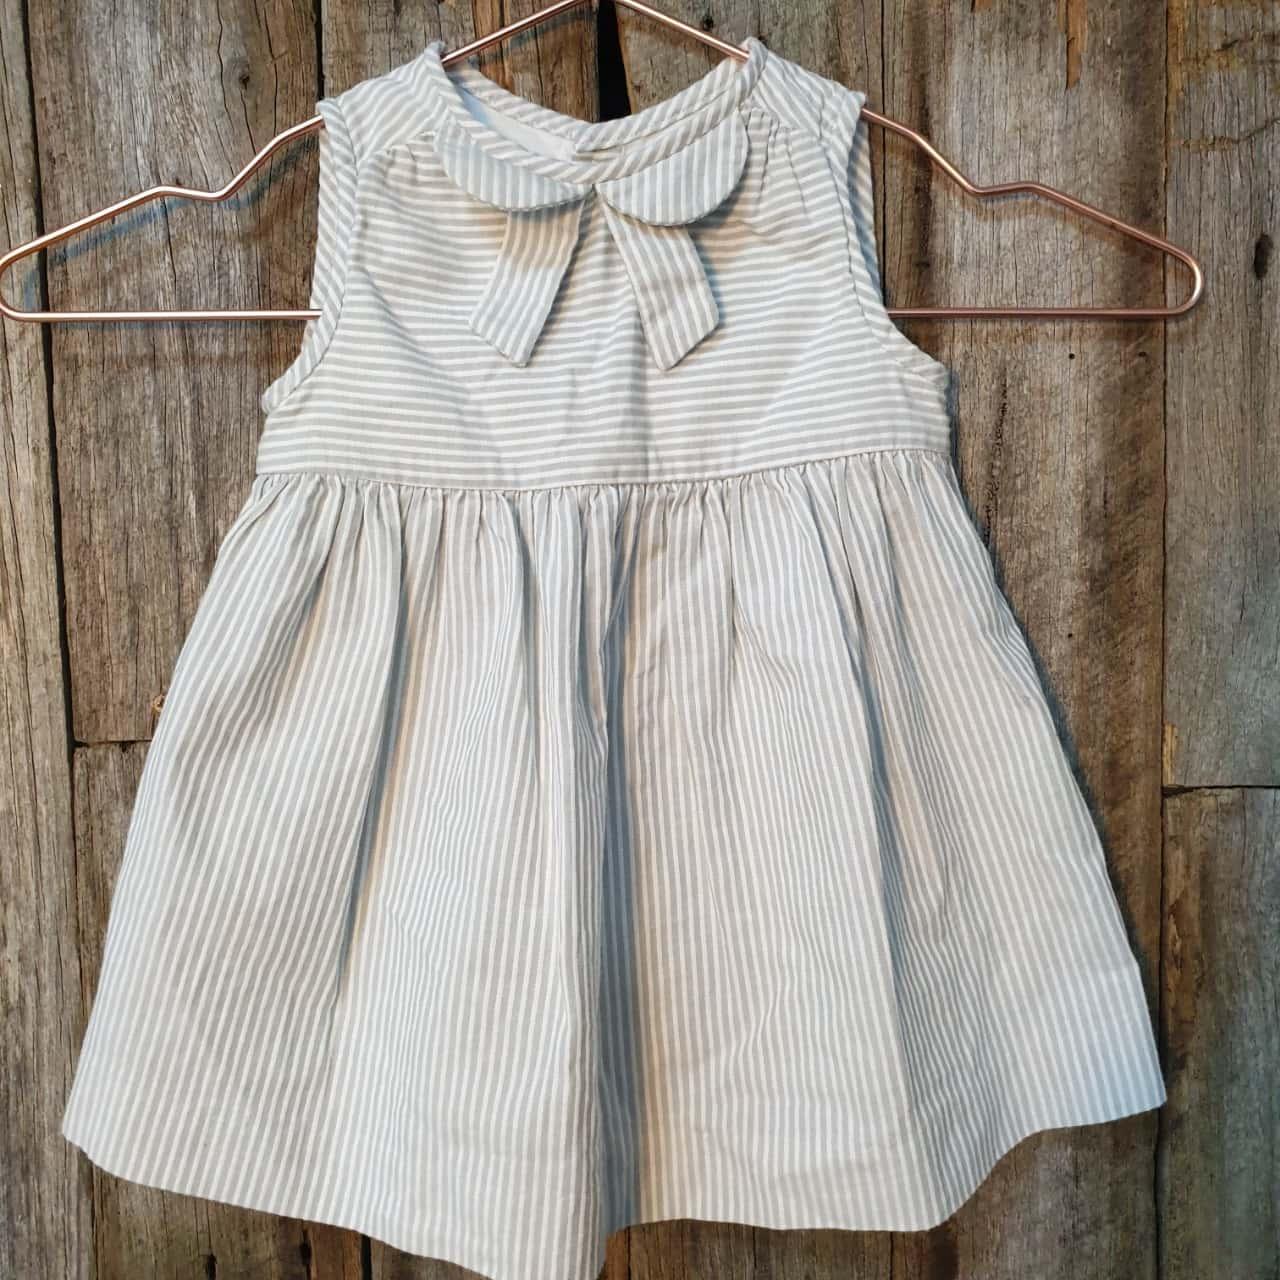 Baby's Jacadi Pinstripe Sleeveless Dress 6 months